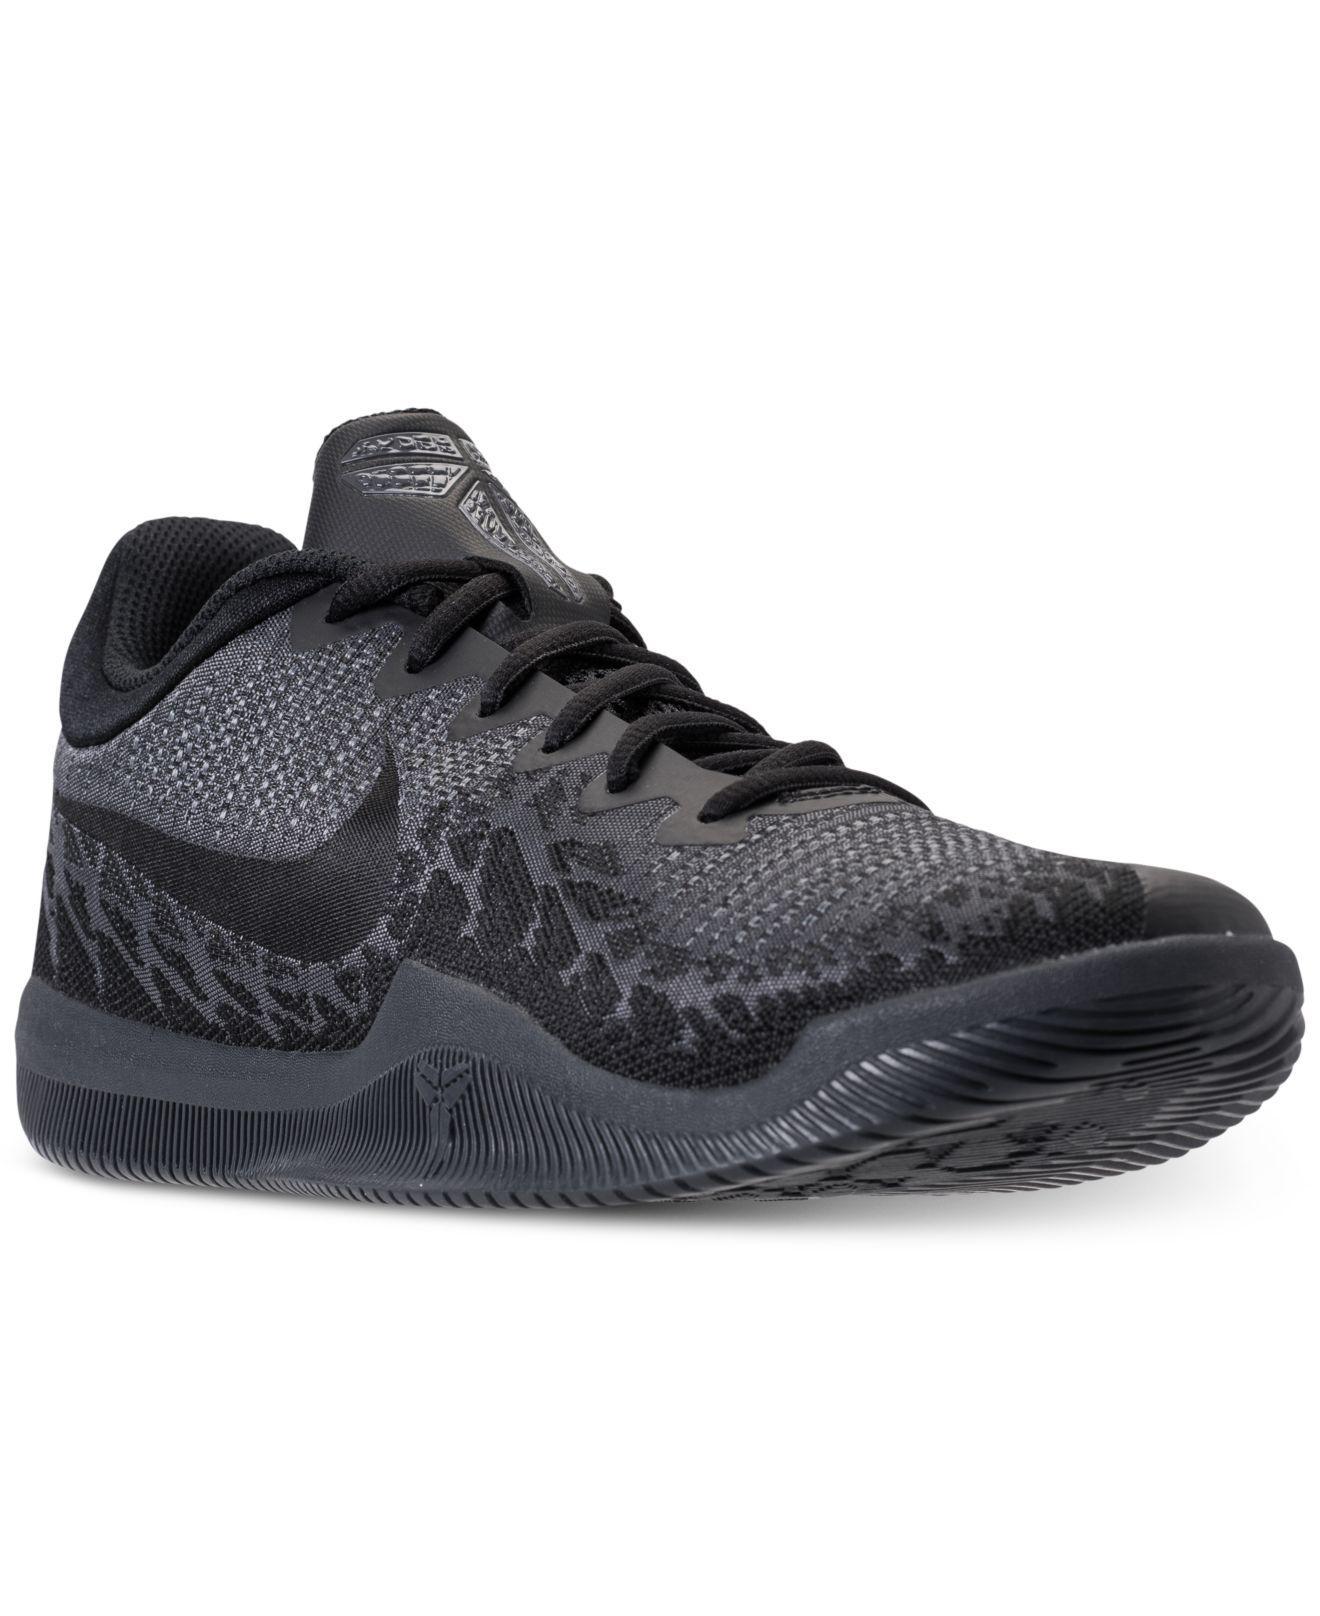 4130256eb15 Nike Men s Kobe Mamba Rage Basketball Sneakers From Finish Line in ...